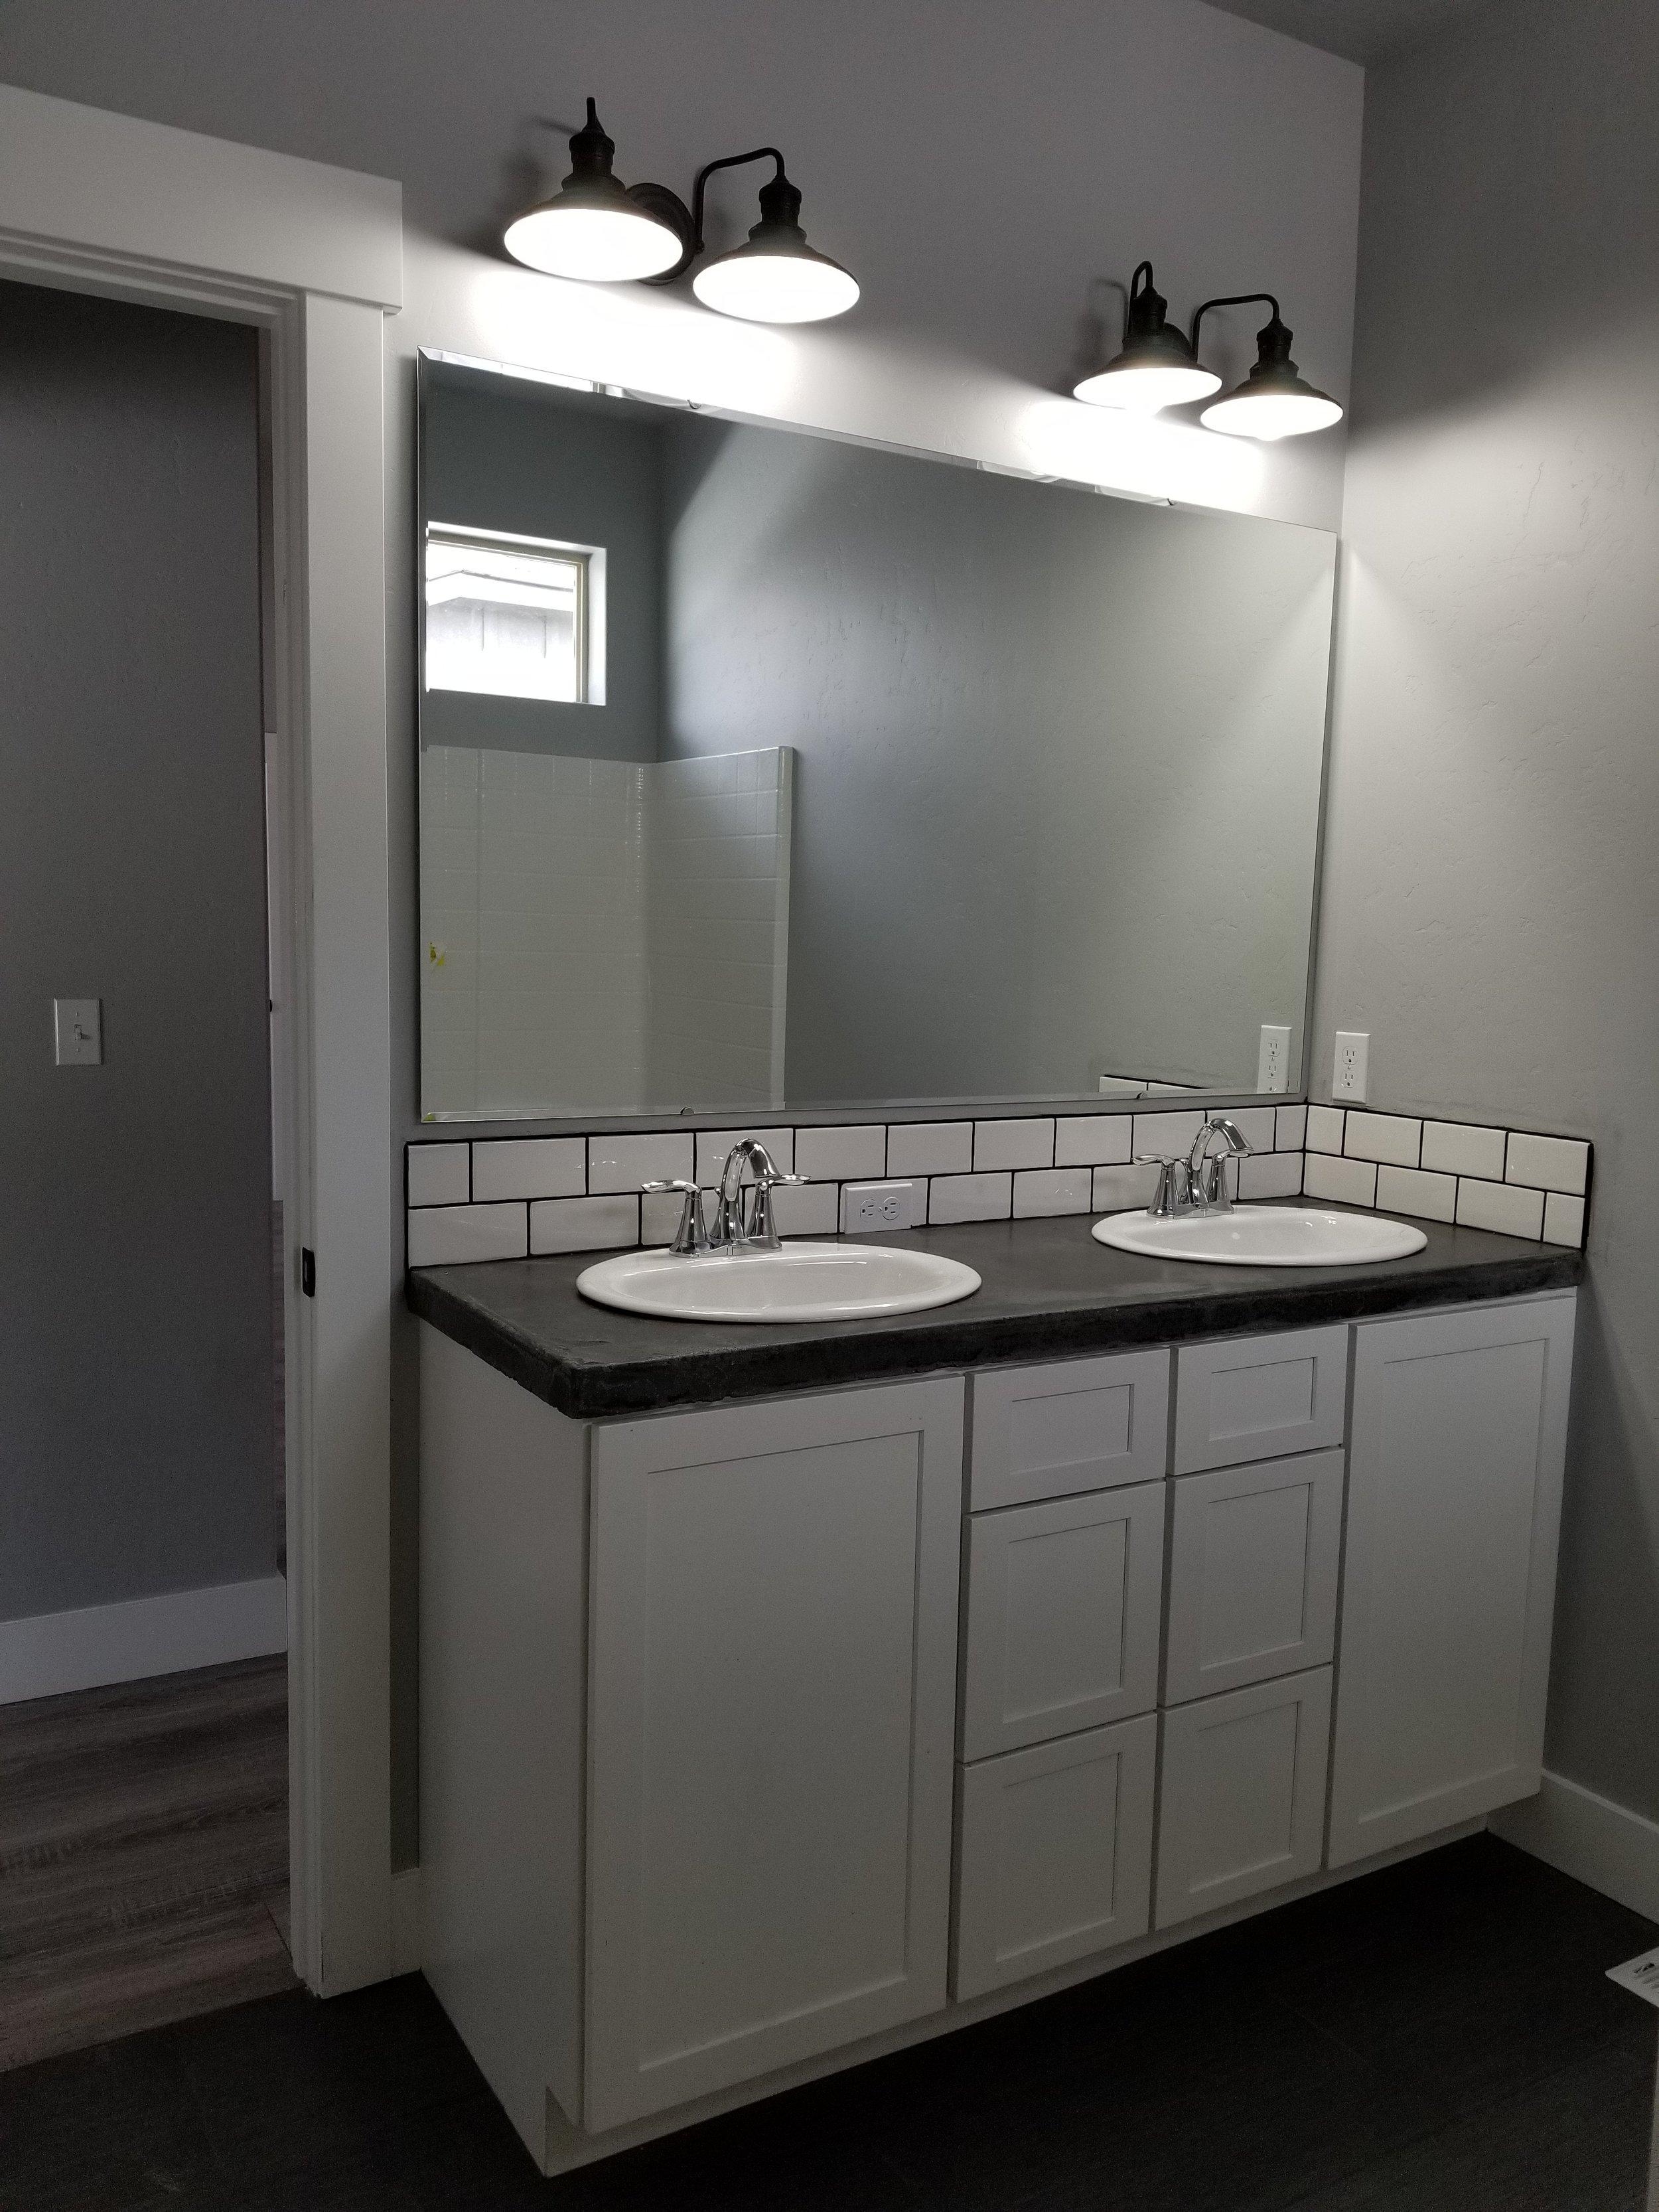 Ben Jen girls bathroom.jpg